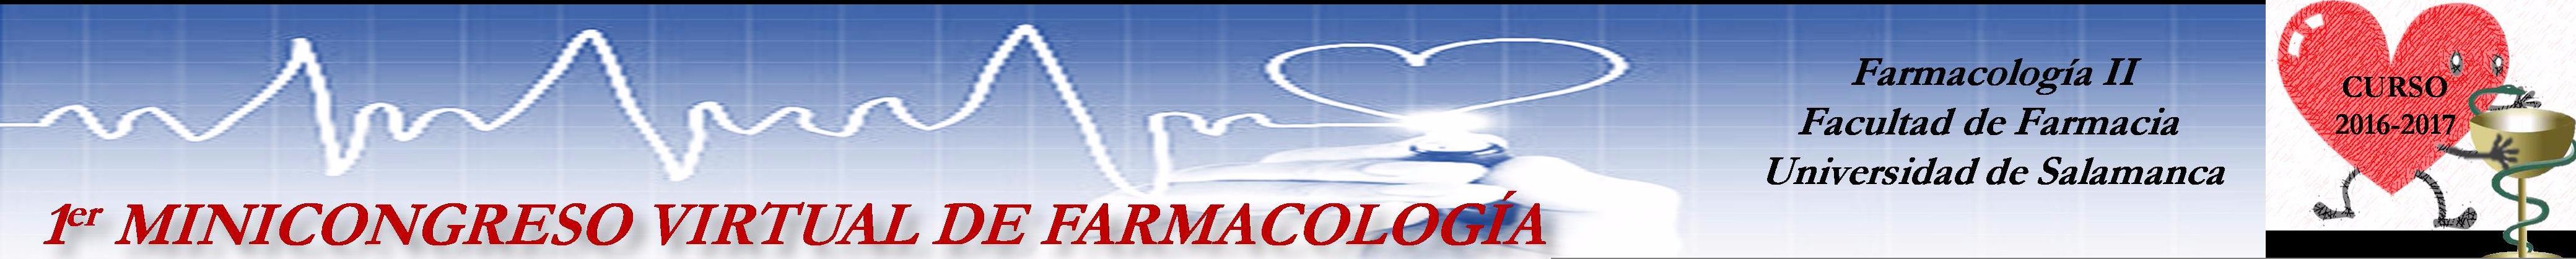 minicongreso-farmacologc3ada-e1494490548519.jpg